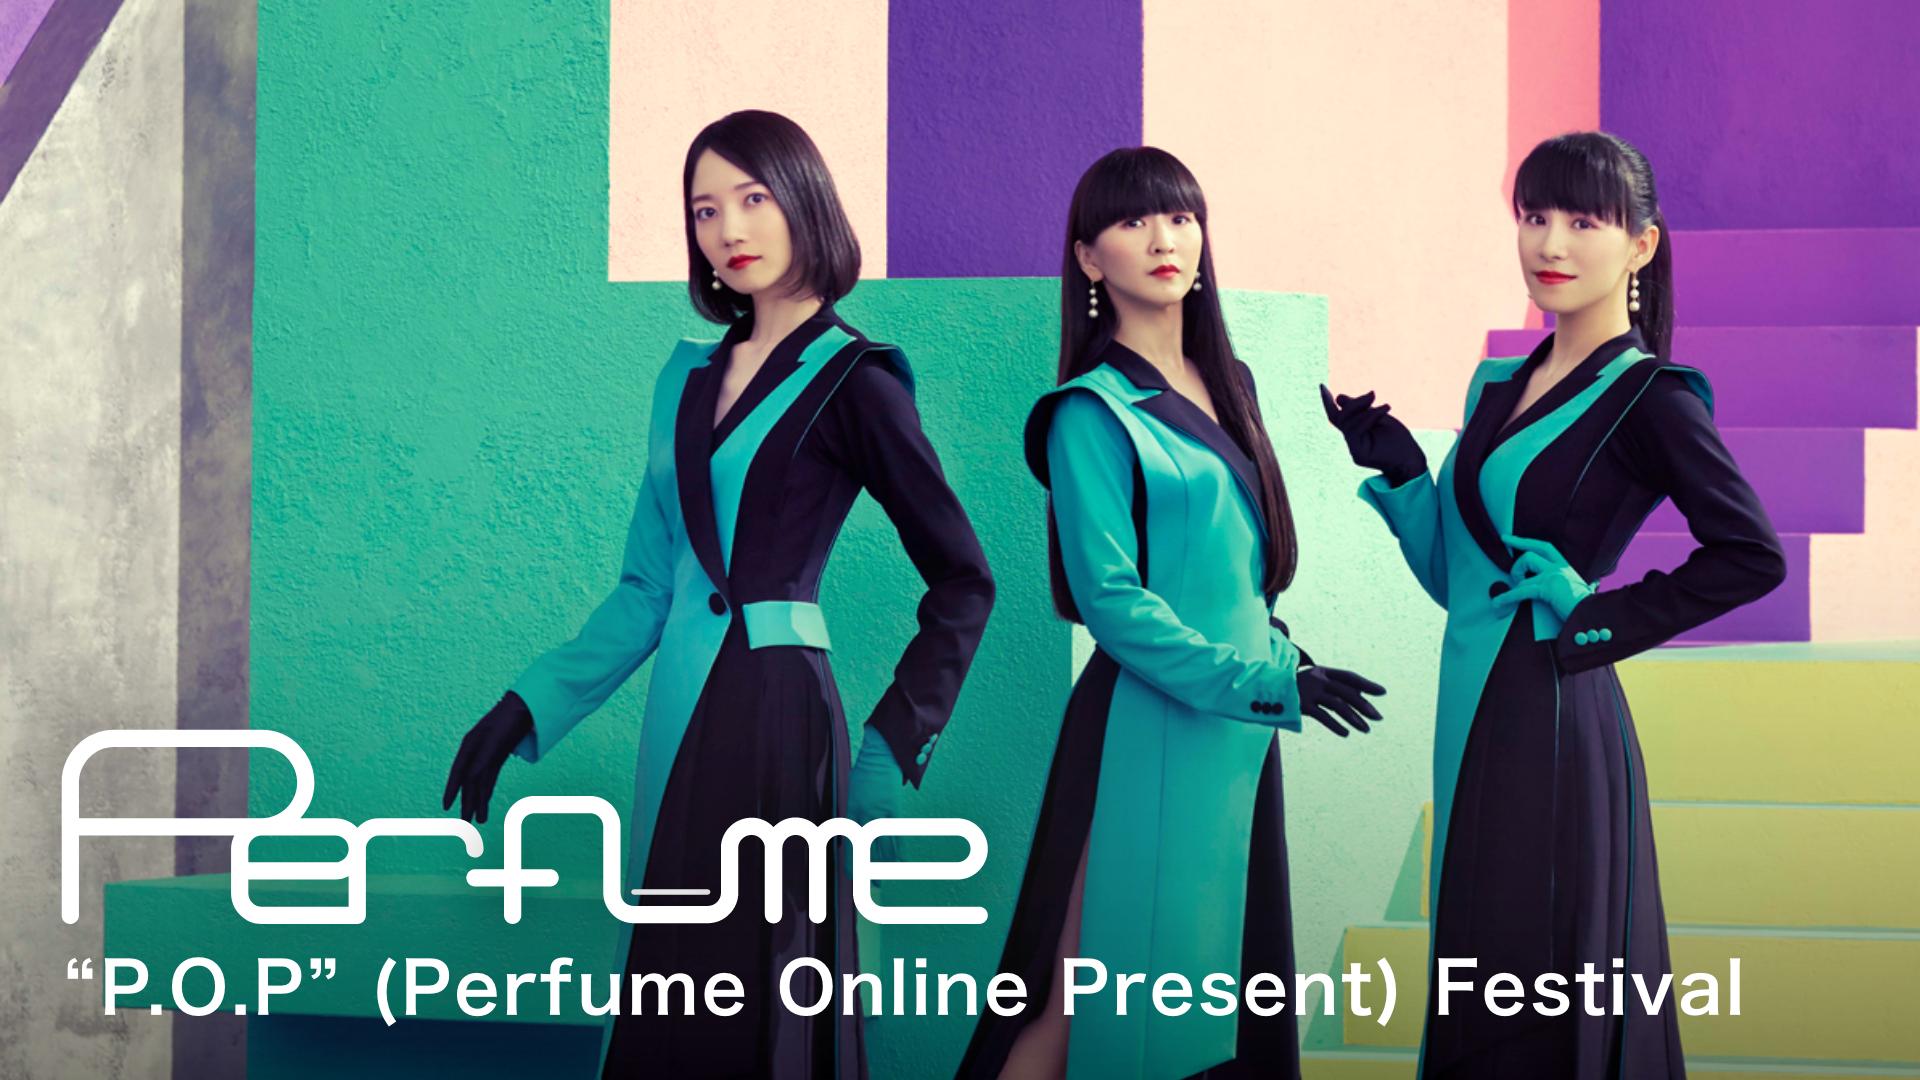 "『""P.O.P""(Perfume Online Present) Festival』ライブ配信動画を無料で視聴する方法まとめ!セットリストも調査!"